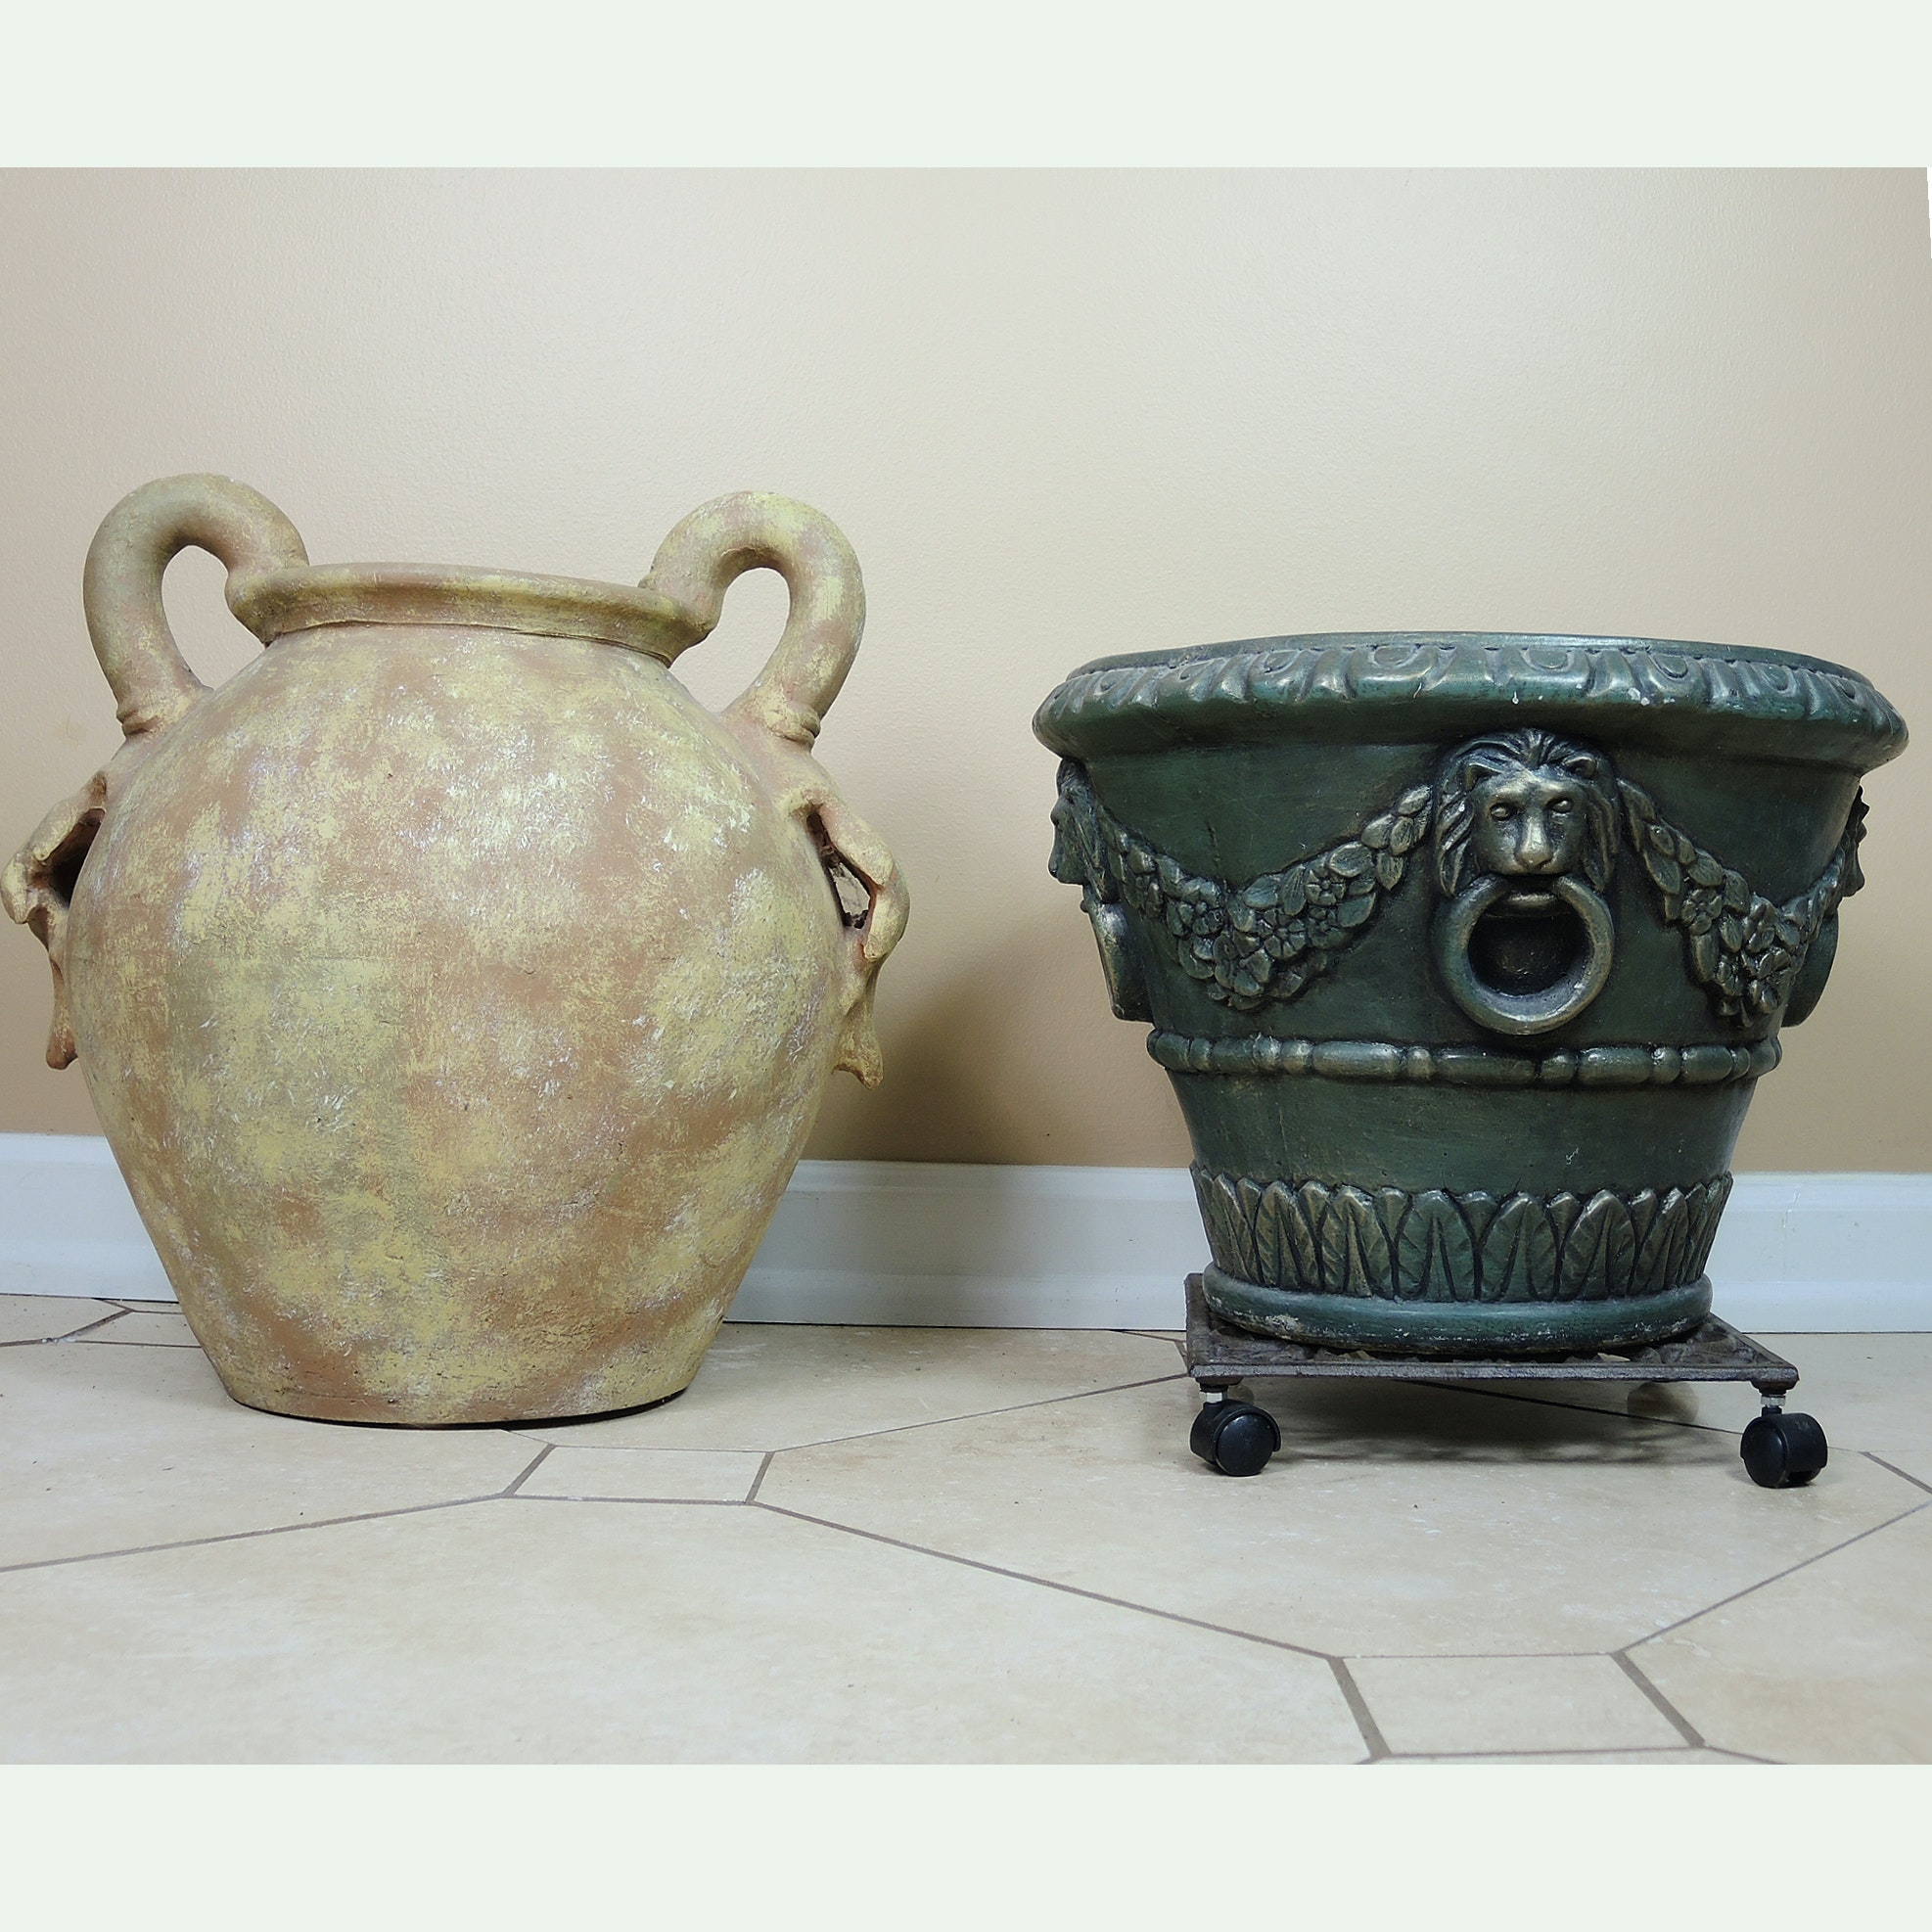 Decorative Vase and Garden Planter